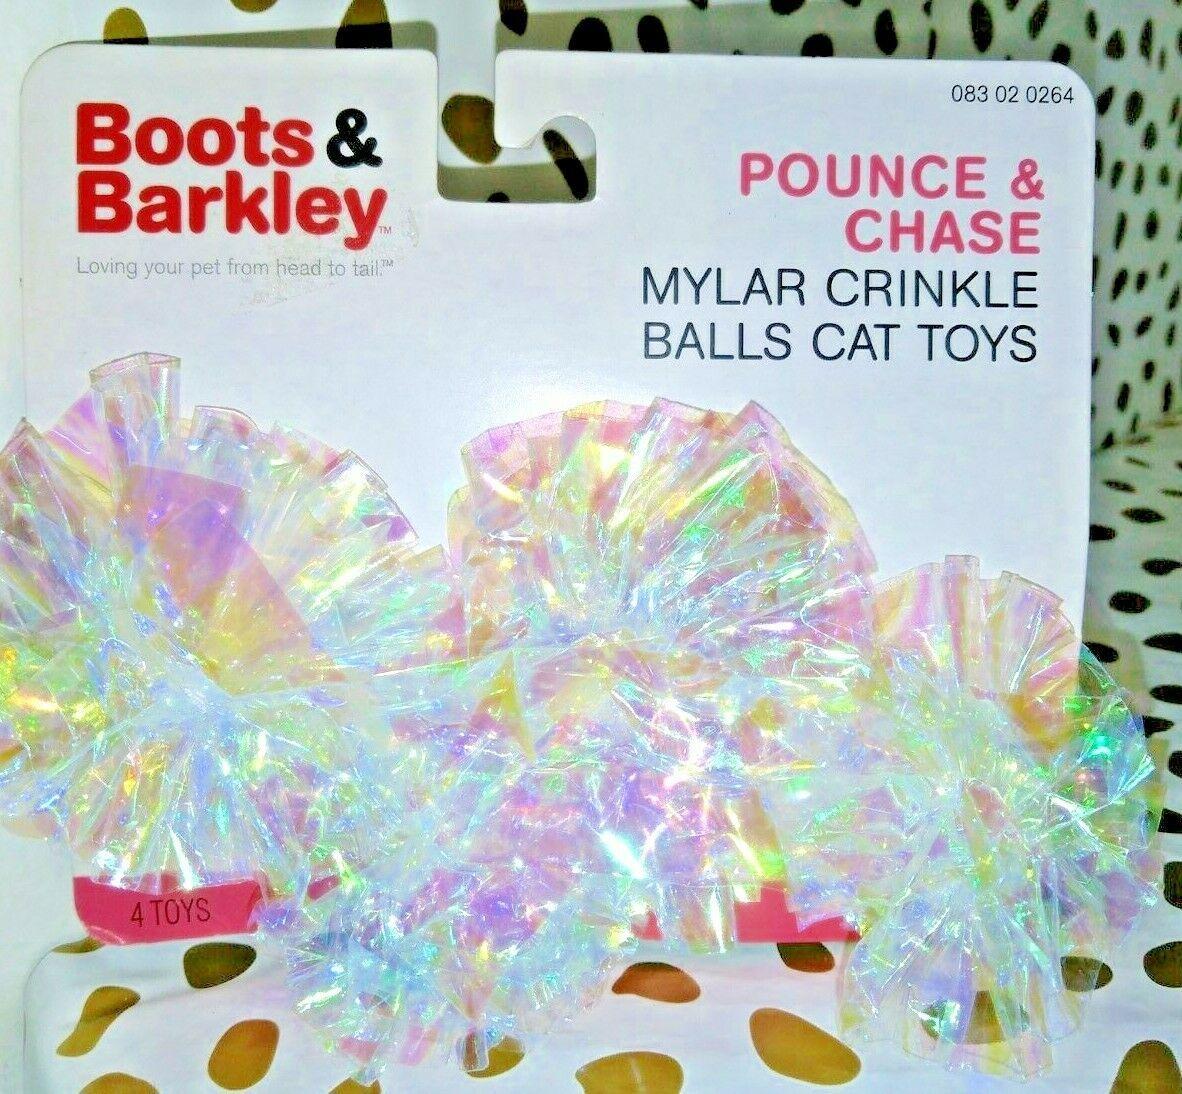 Boots & Barkley  Pounce & Chase Mylar Crinkle Balls Cat Toys  store --NEW!